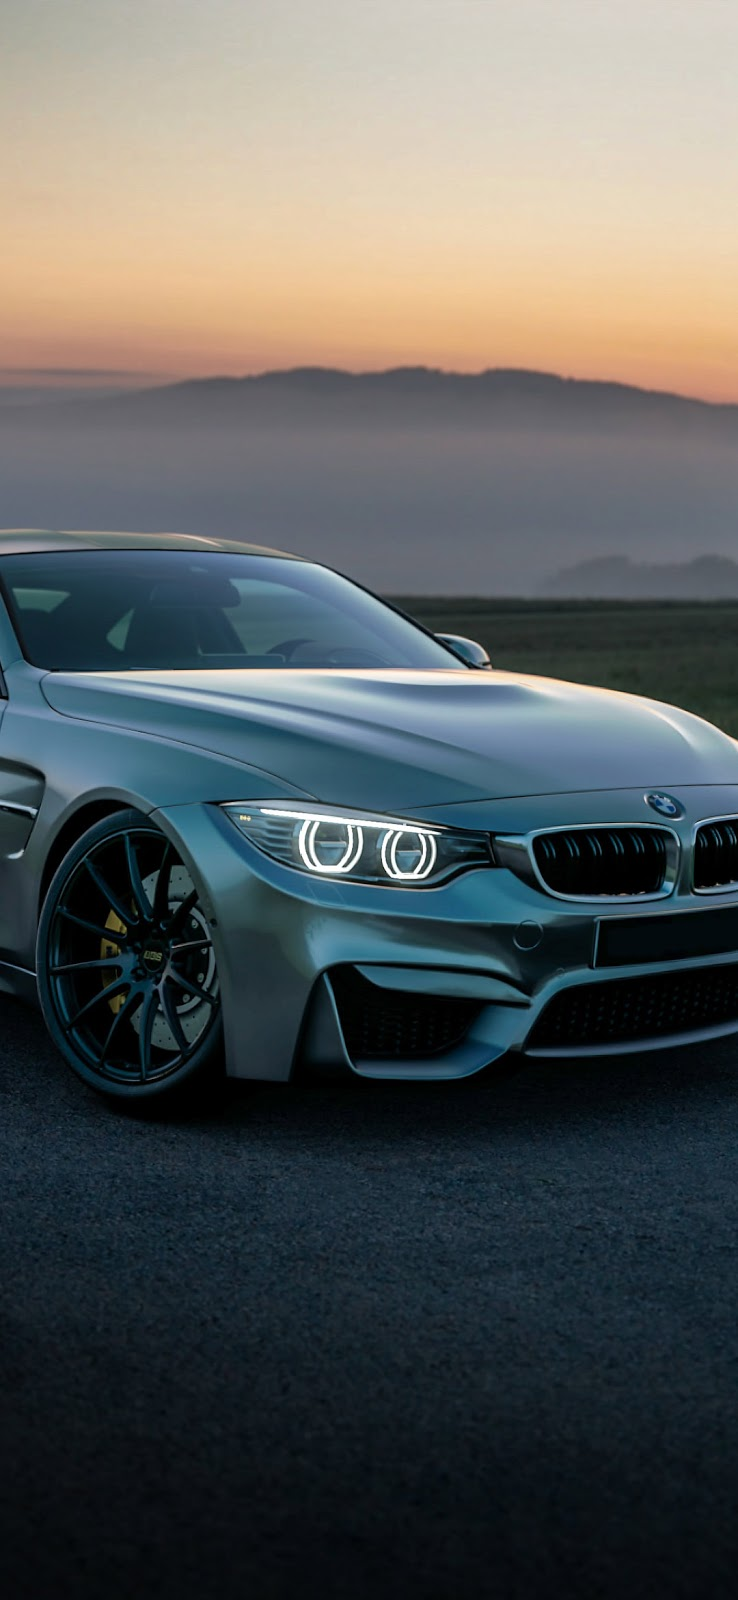 Gray BMW coupe on black asphalt road